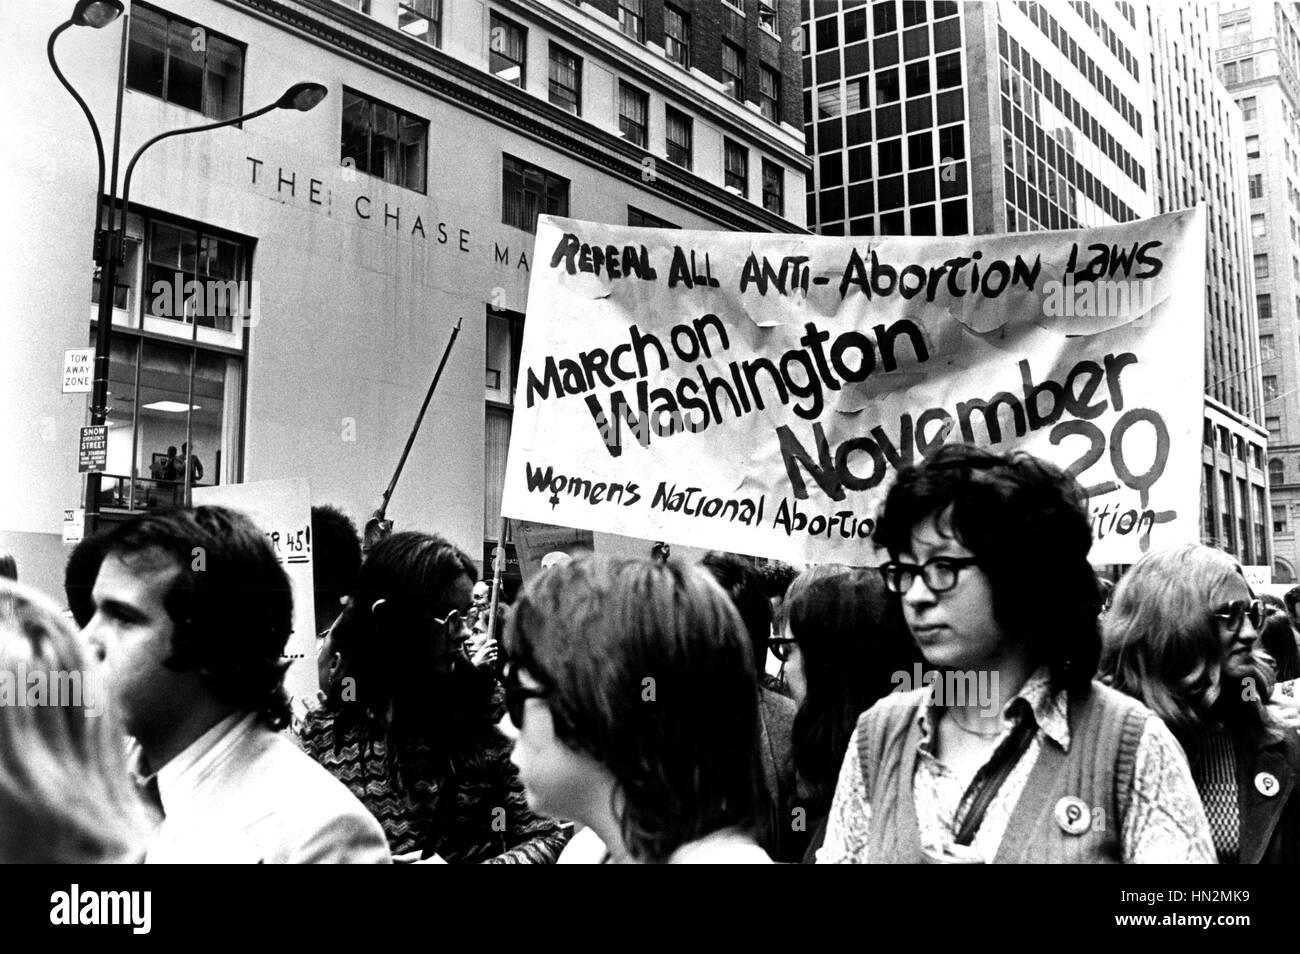 8bf4c2a285 Women's Liberation 1970s Stock Photos & Women's Liberation 1970s ...